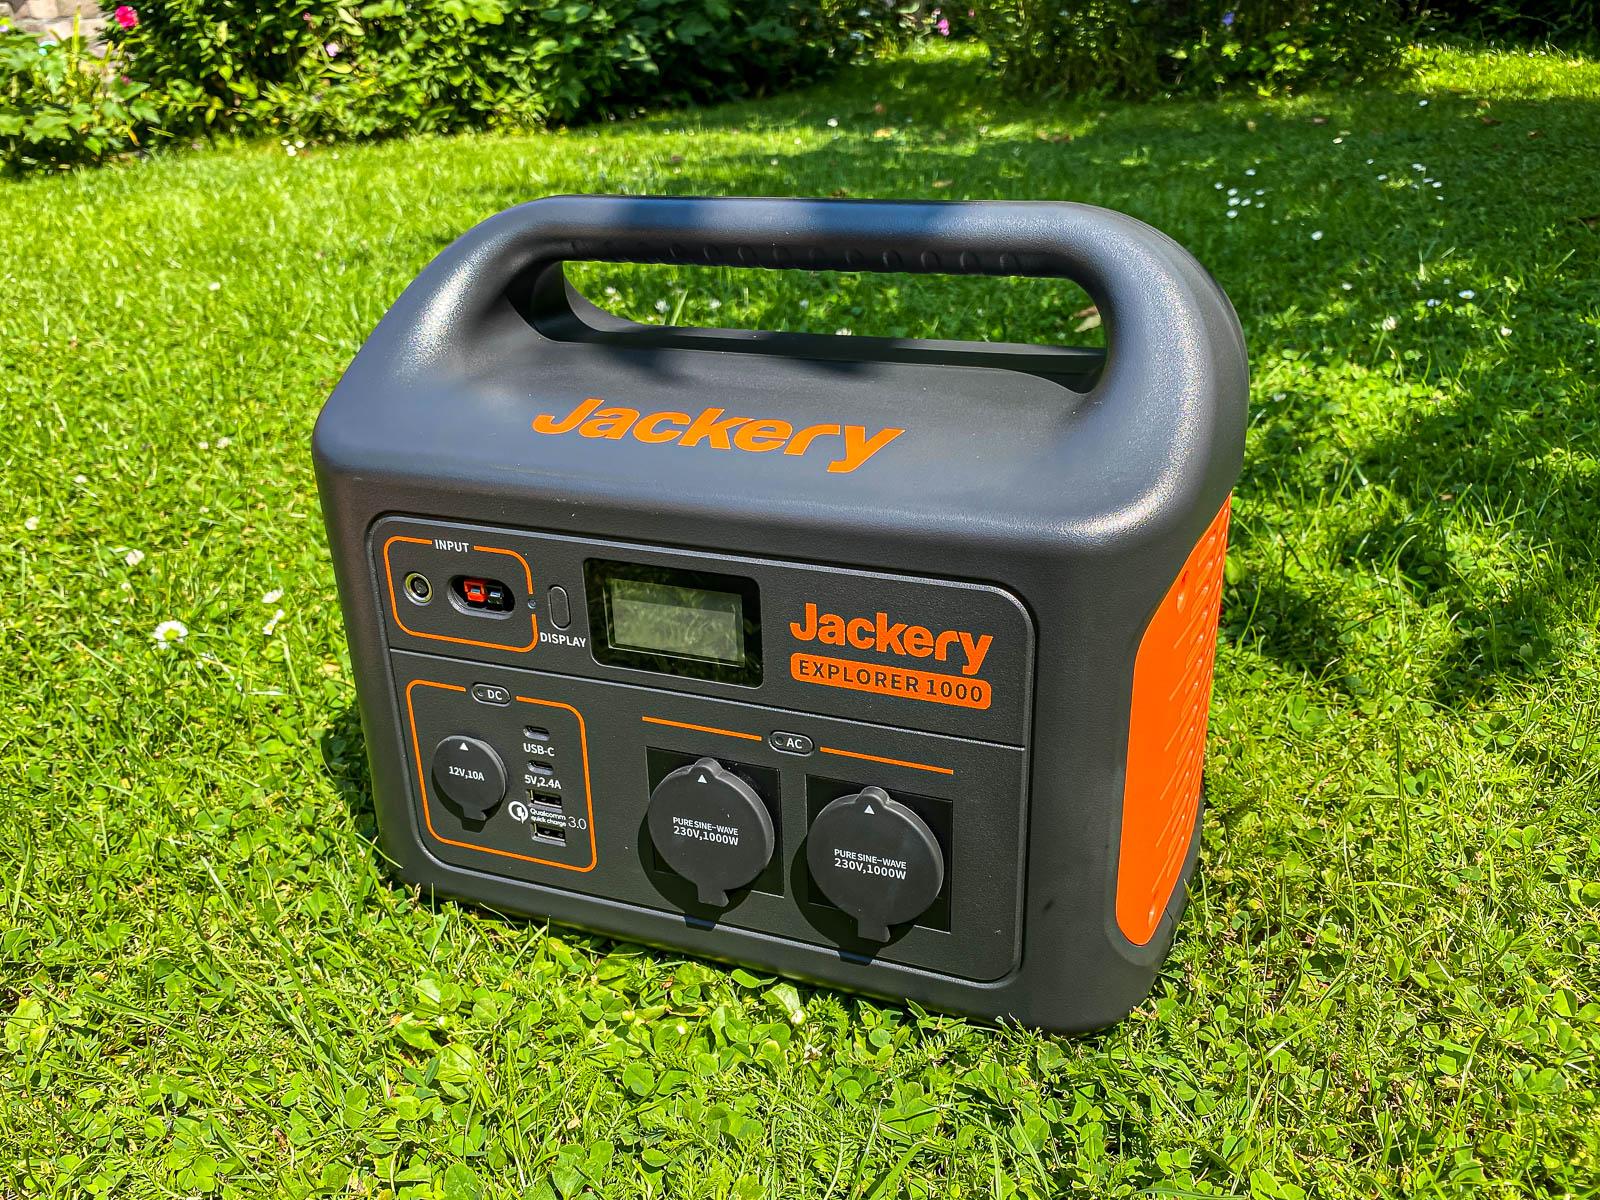 Jackery Explorer 1000 Powerstation Test - Front, Anschlüsse, Bedienfeld, Titelbild